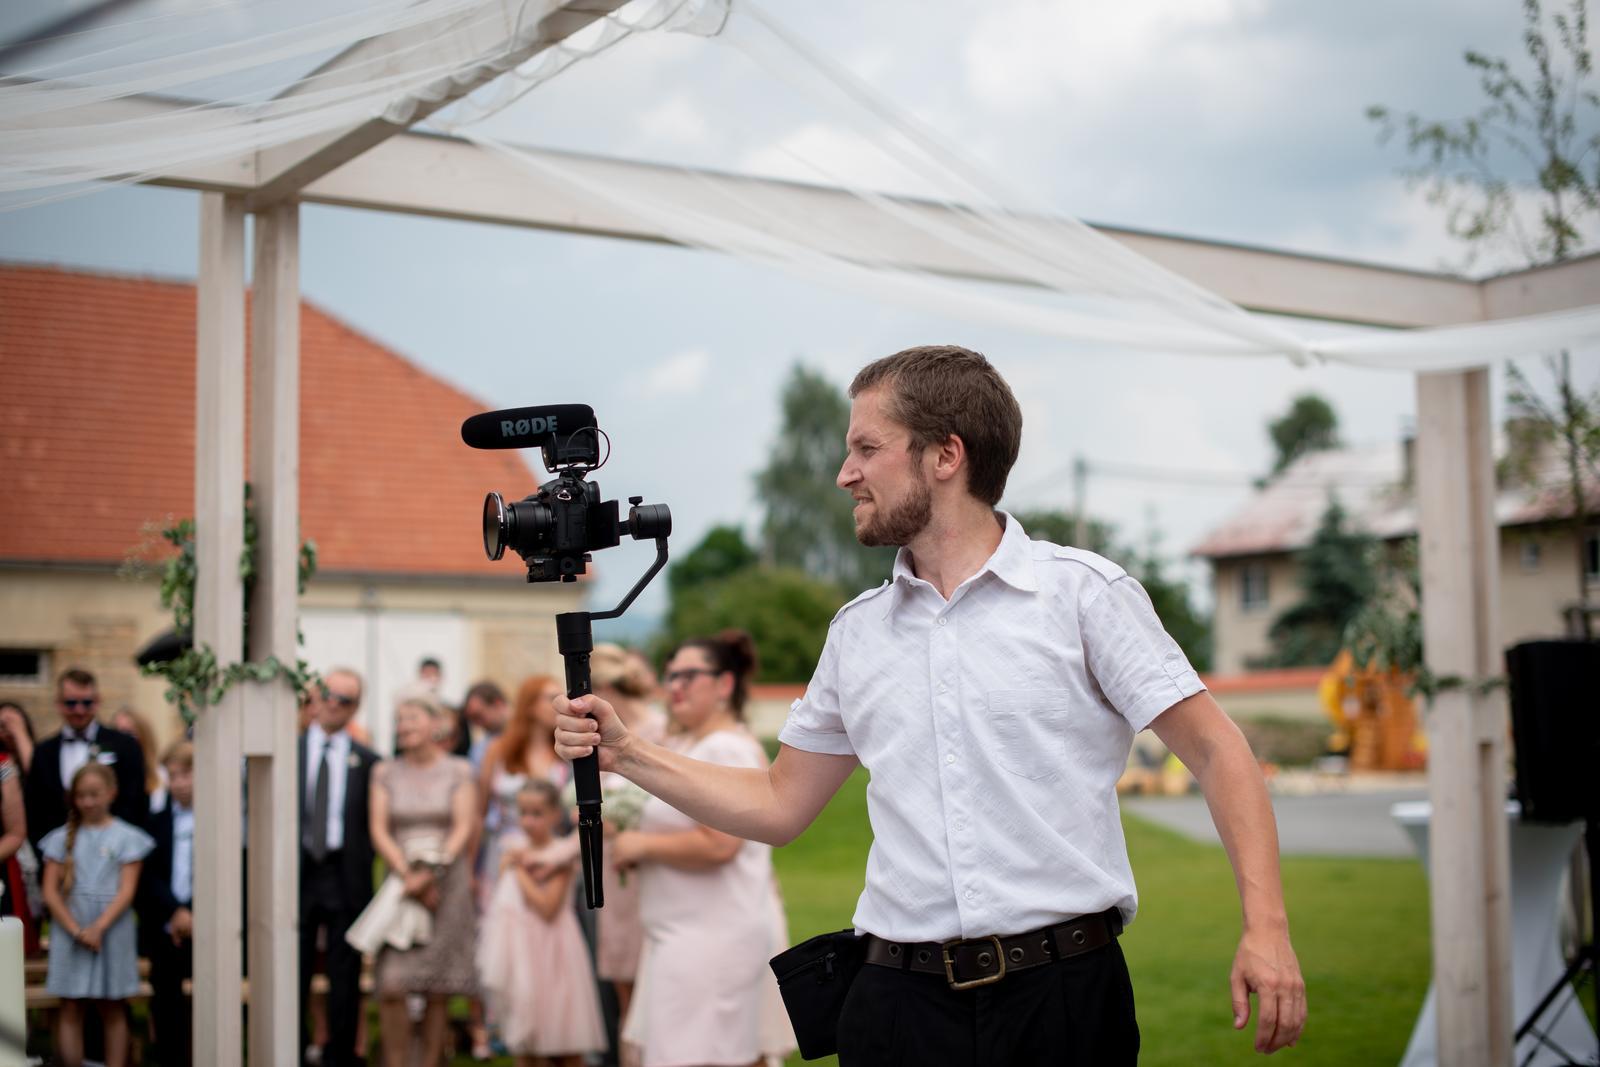 miroslav_prousek - V akci :) (Foto: Simona a Ondřej Fialovi)